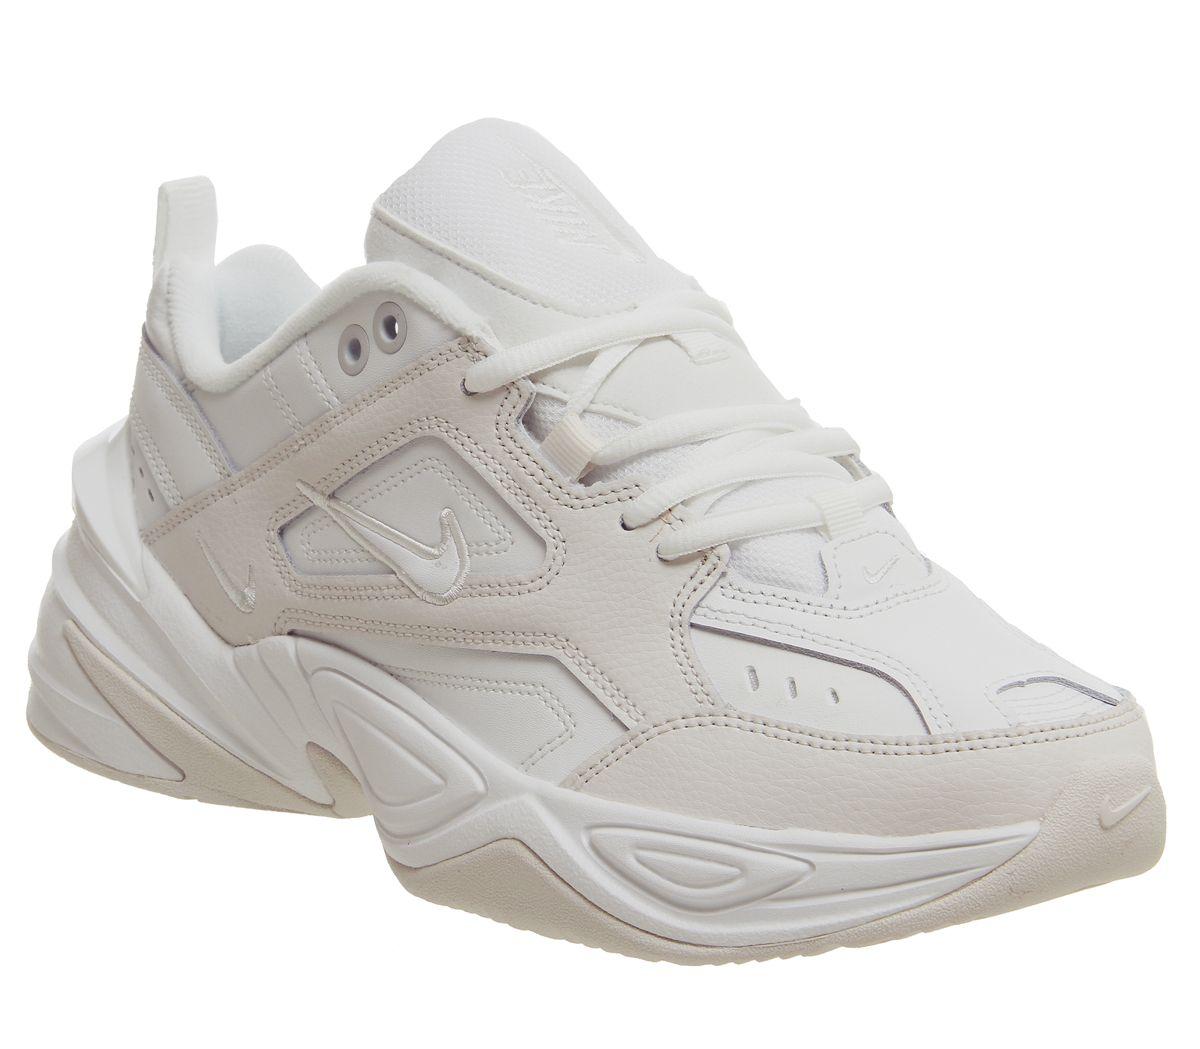 the best attitude 359f3 6396c Nike M2k Tekno Trainers Phantom Summit White - Hers trainers